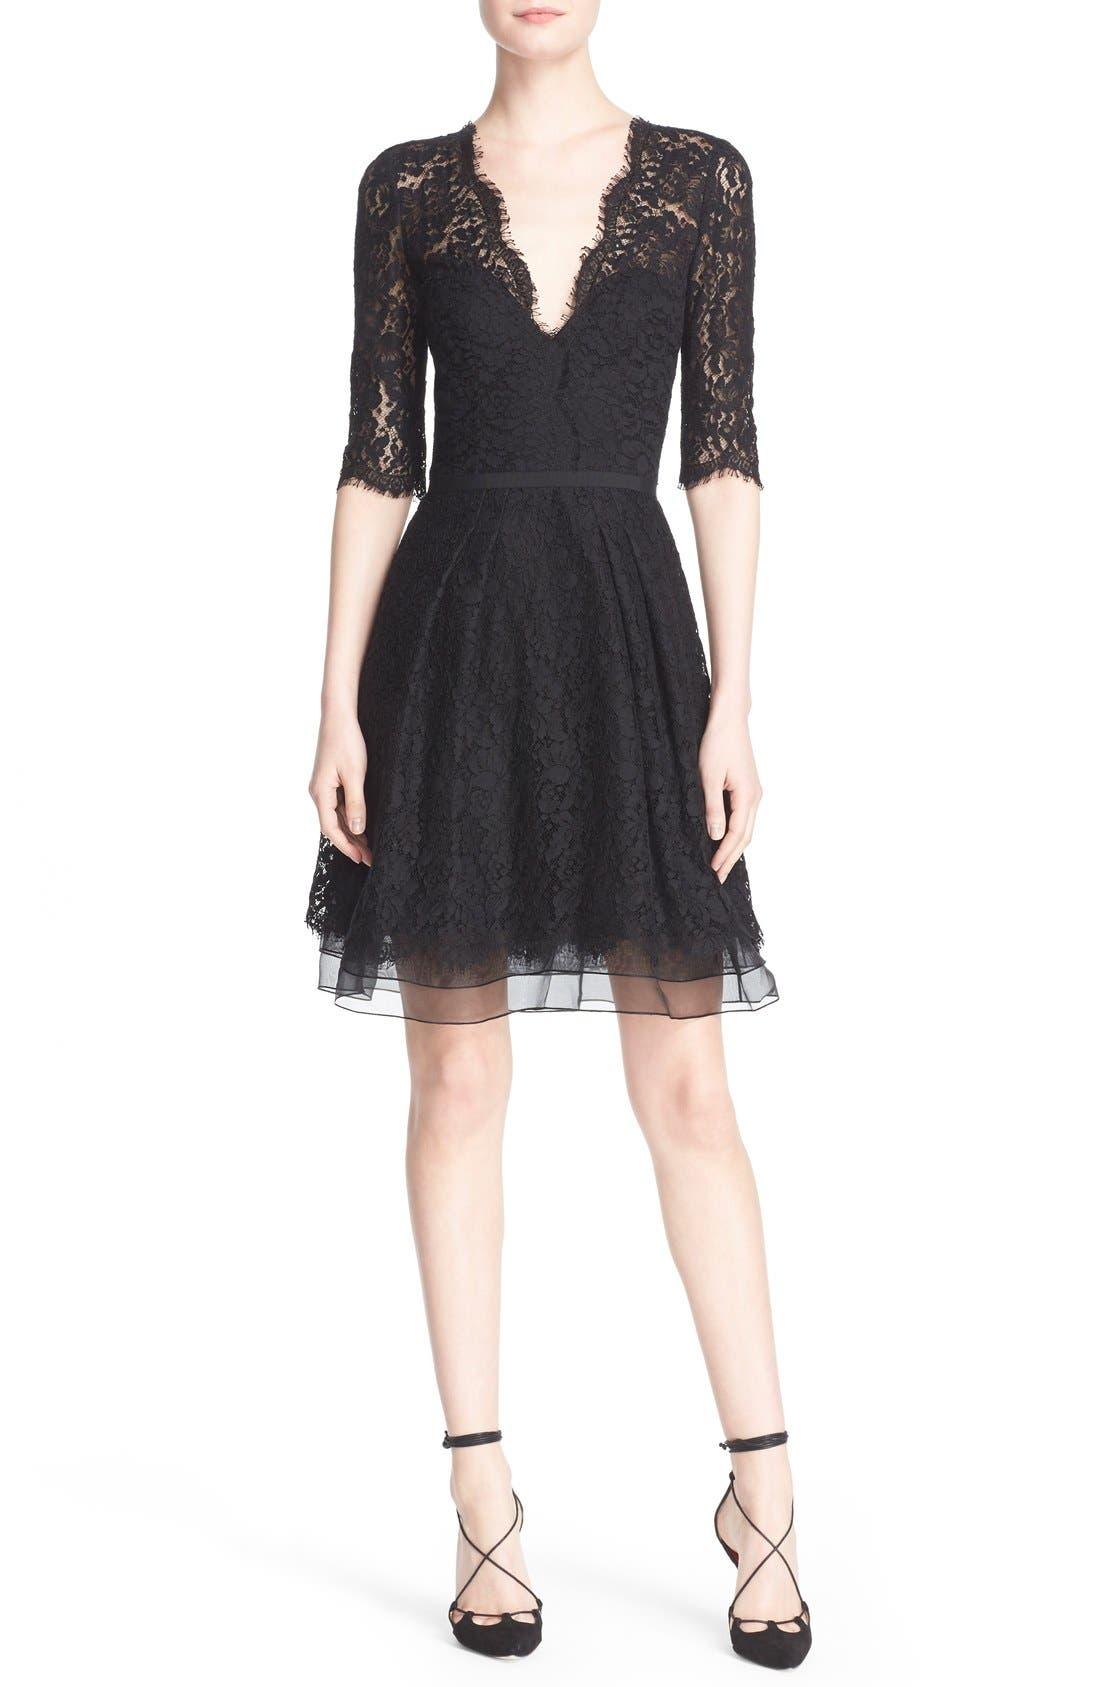 Carolina Herrera Lace A-Line Cocktail Dress